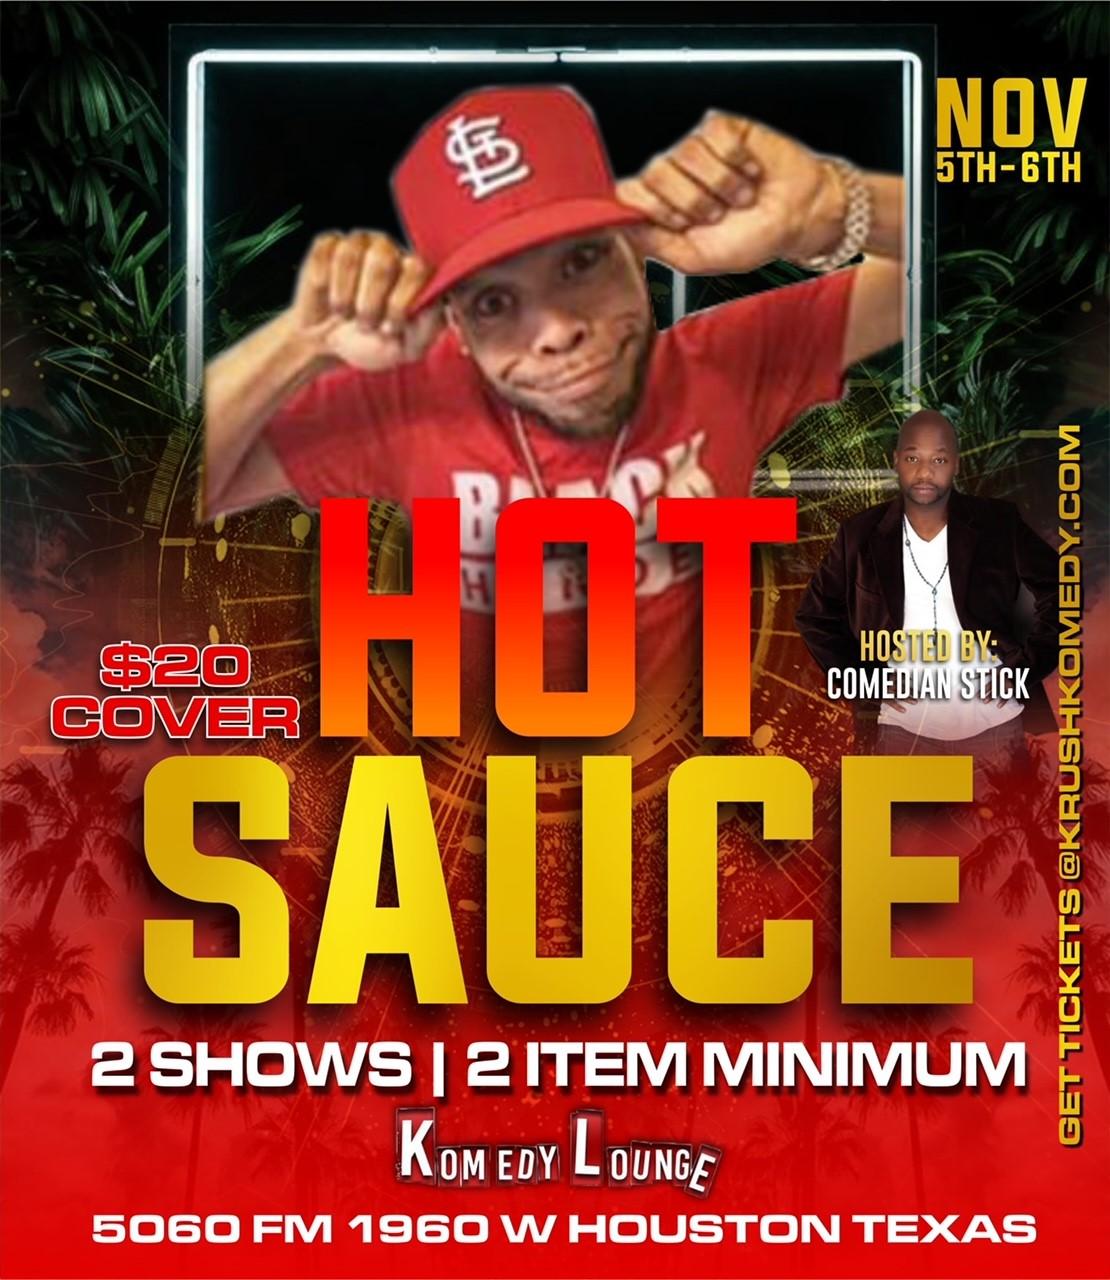 Comedian Hot Sauce 8pm  on Nov 05, 20:00@Komedy Lounge - Buy tickets and Get information on komedylounge.com